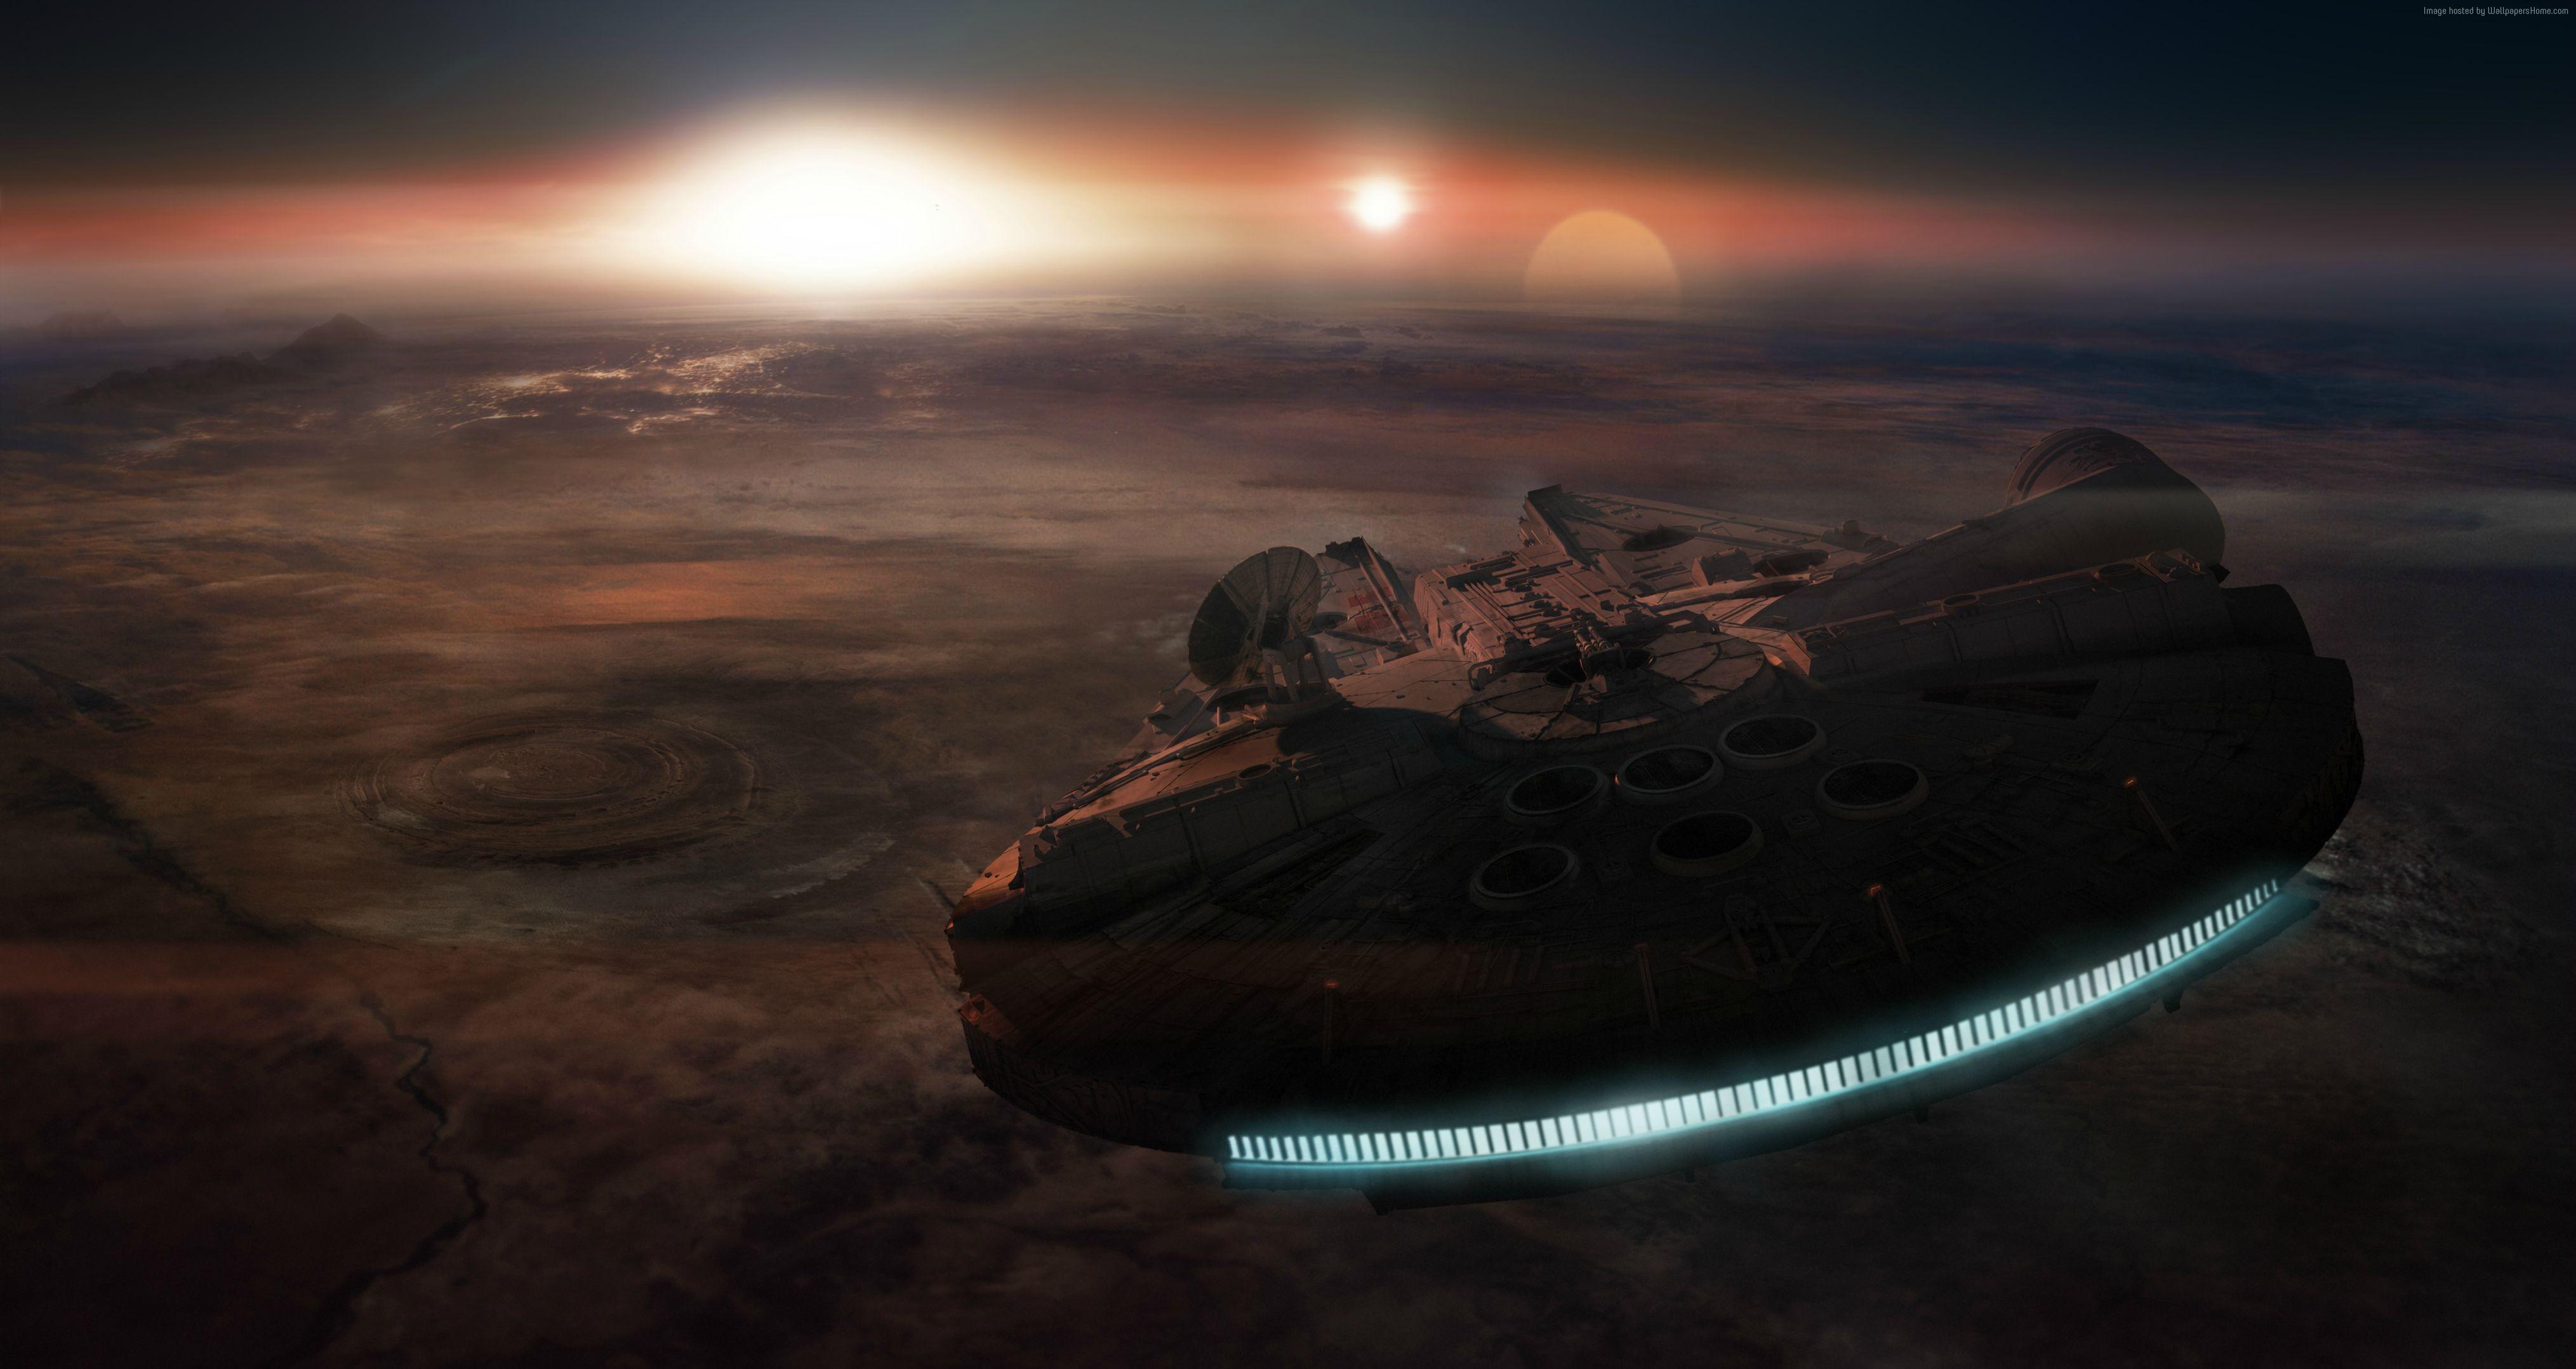 Star Wars Episode VII The Force Awakens Wallpaper Movies Star Wars 4058x2156